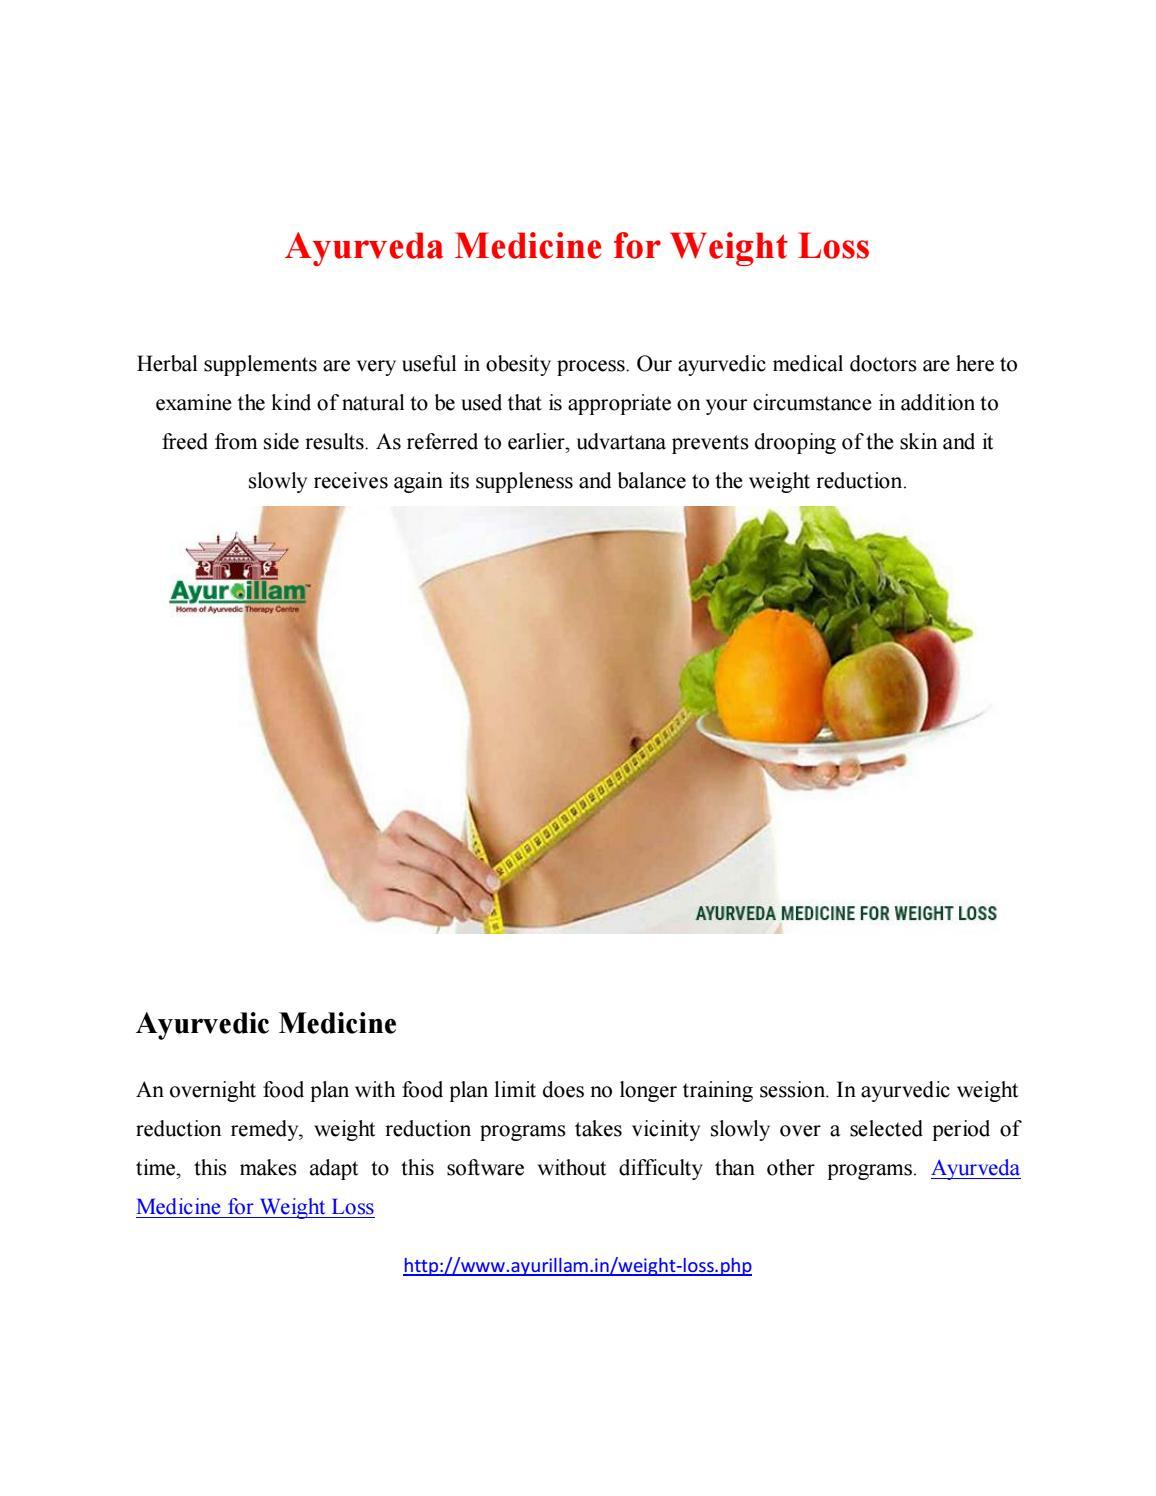 Ayurveda medicine for weight loss by rathnamadhuri66 - issuu